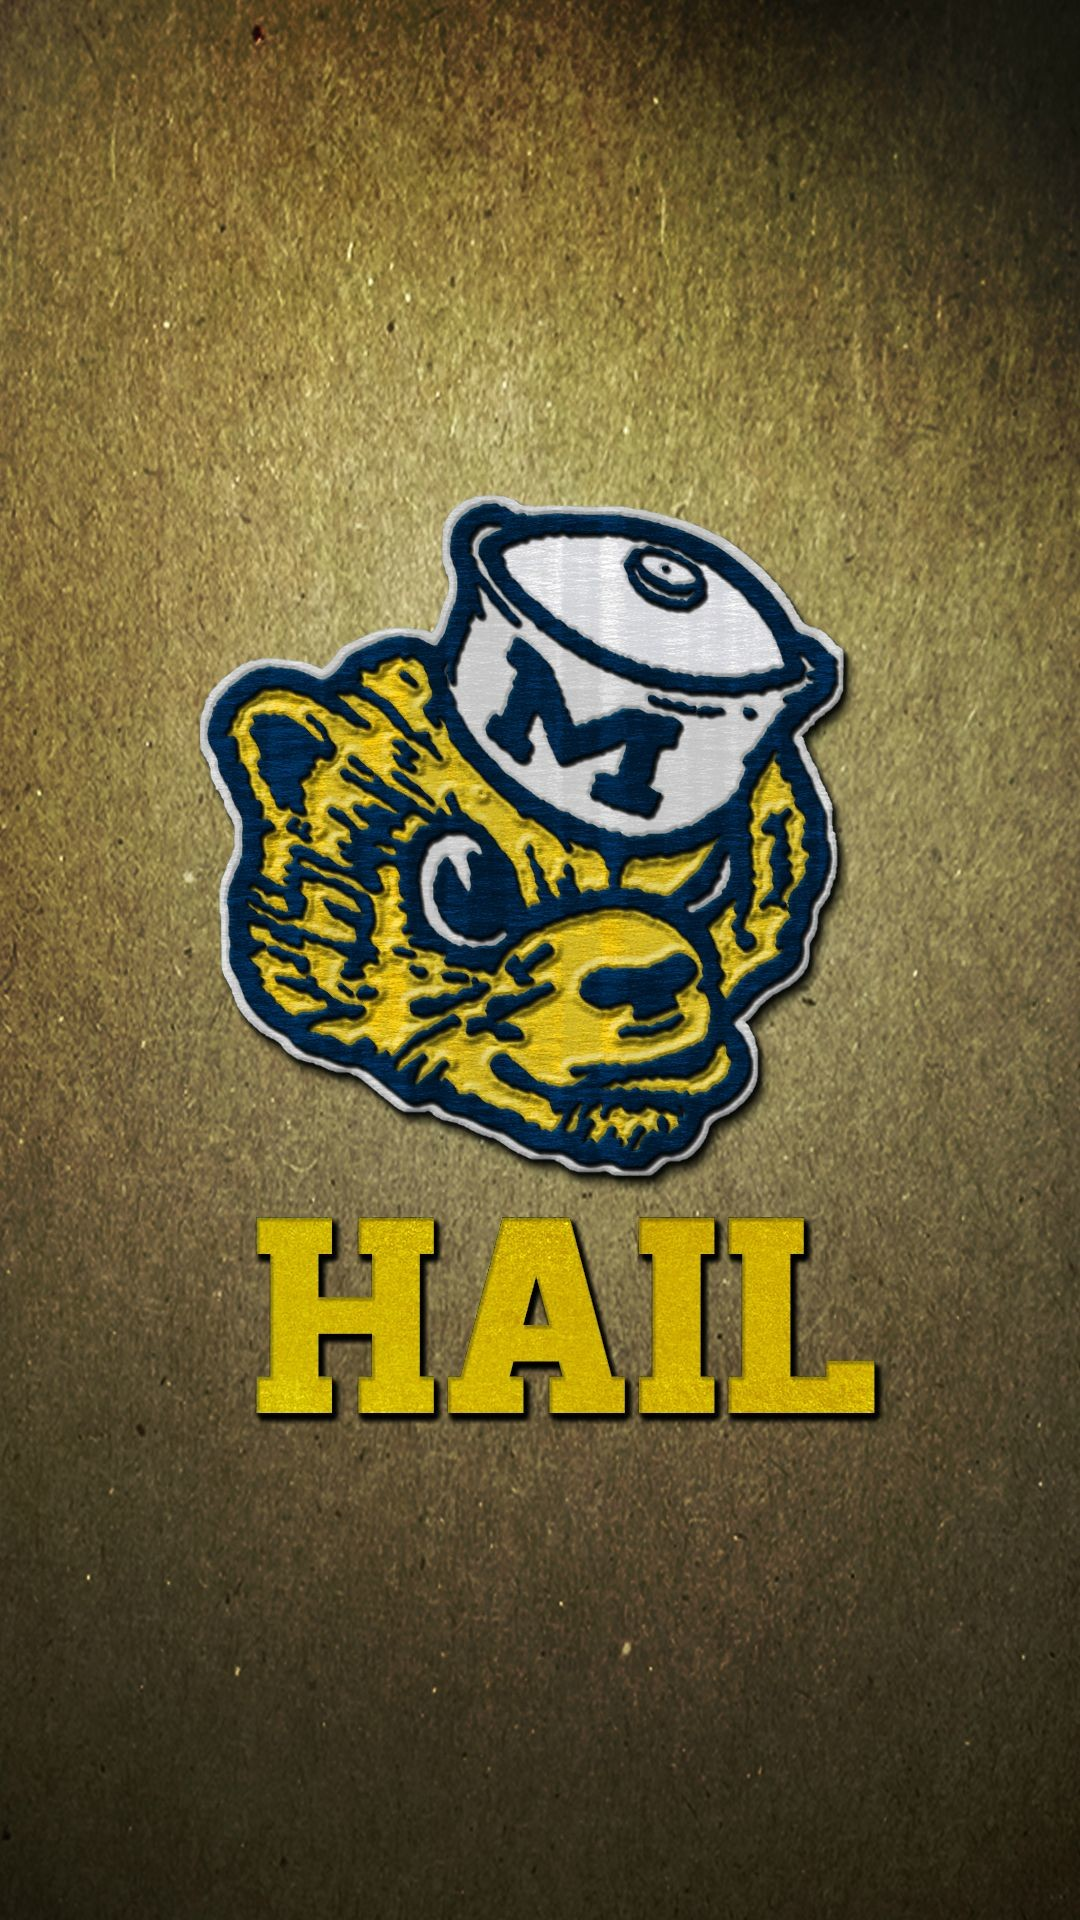 MICHIGAN WOLVERINES college football wallpaper x | HD Wallpapers |  Pinterest | Michigan wolverines and Wallpaper